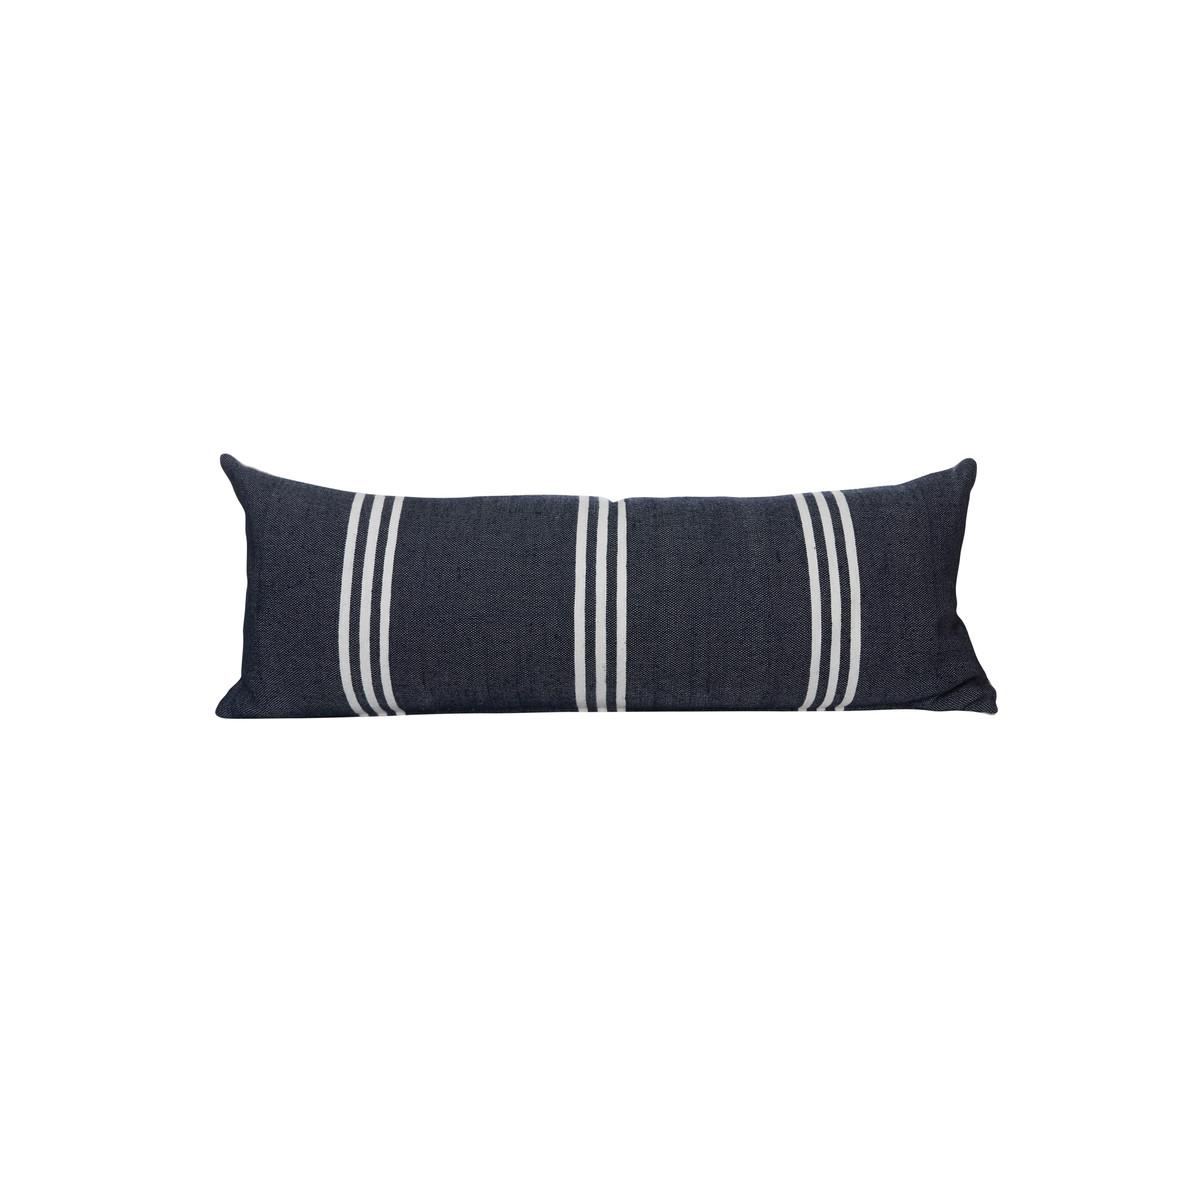 Black Three Stripe  14 x 36 Decorative Lumbar - Front